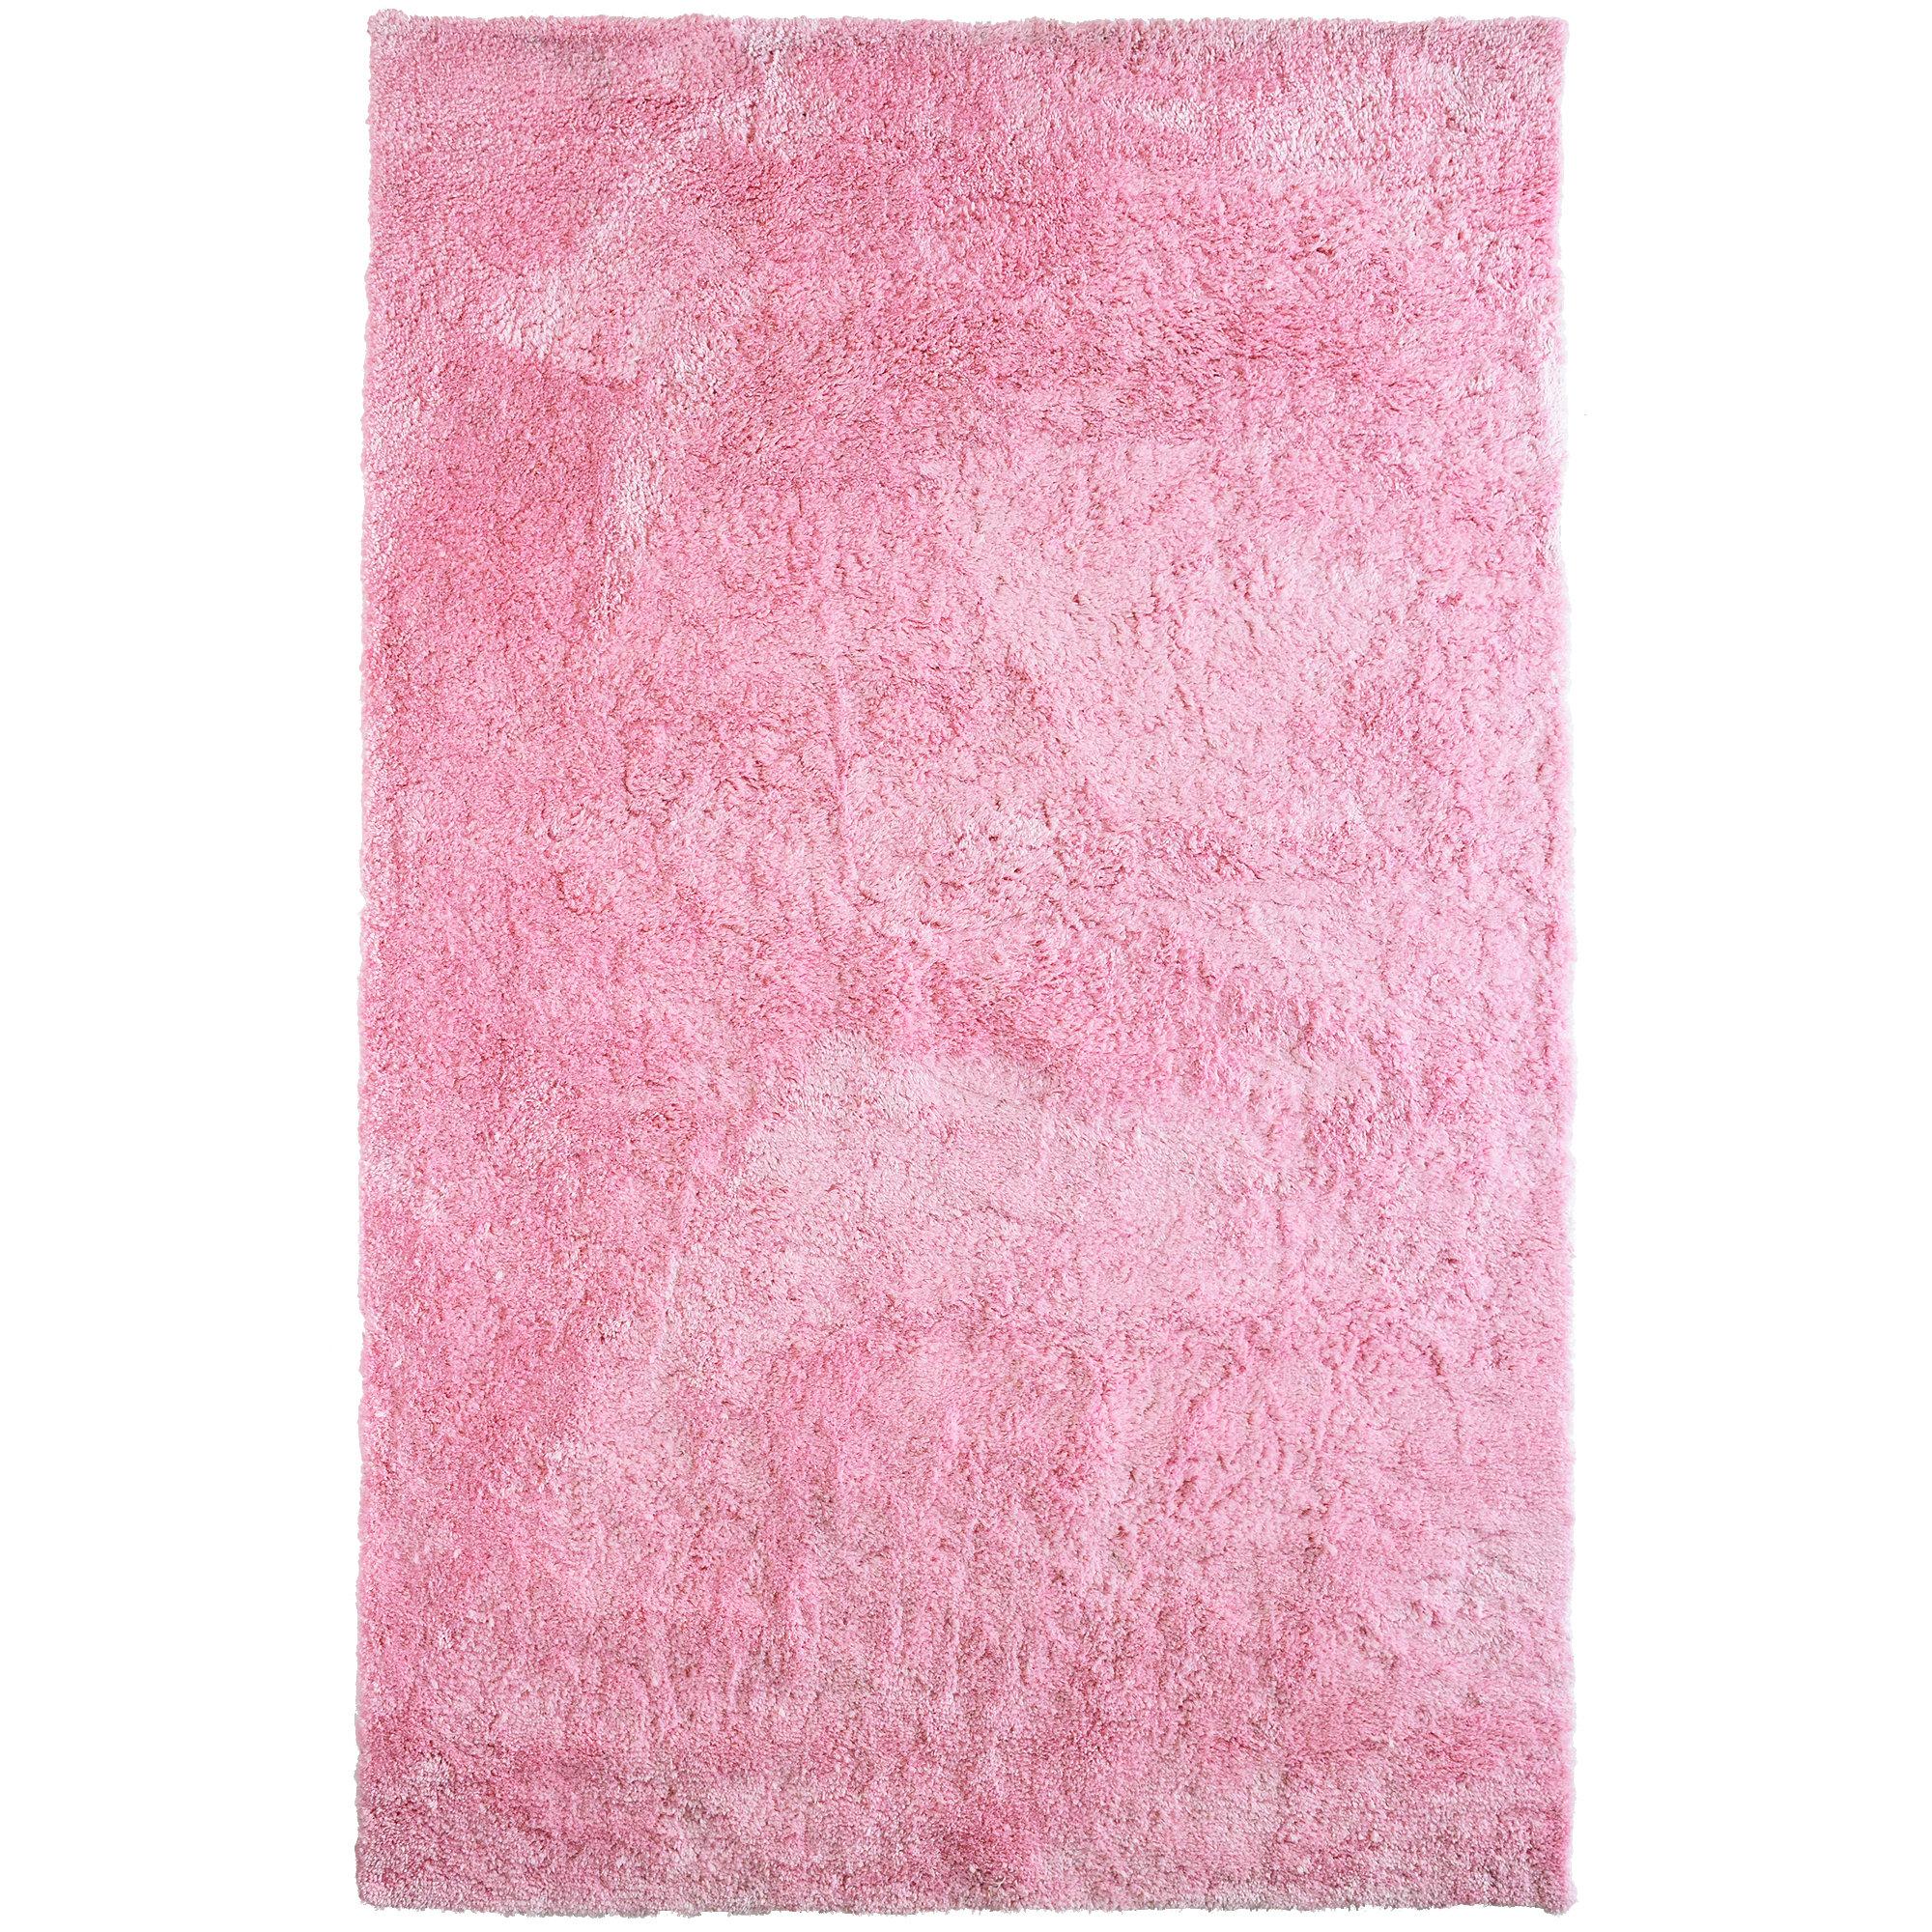 Rug Studio Fur Shag Pink Area Rug